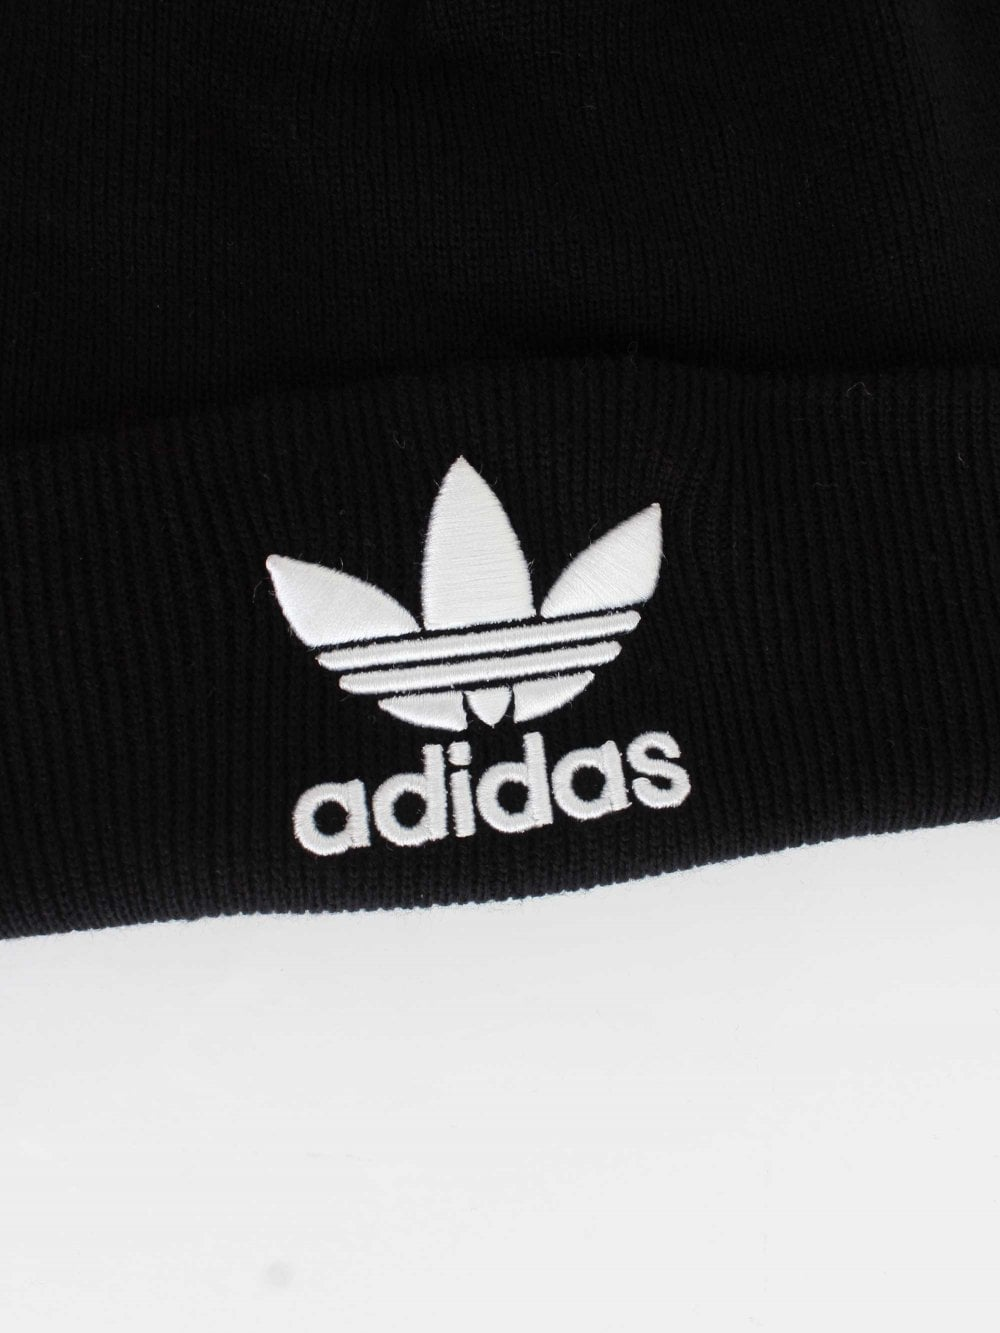 Adidas Trefoil Beanie in Black  cbfca003021d